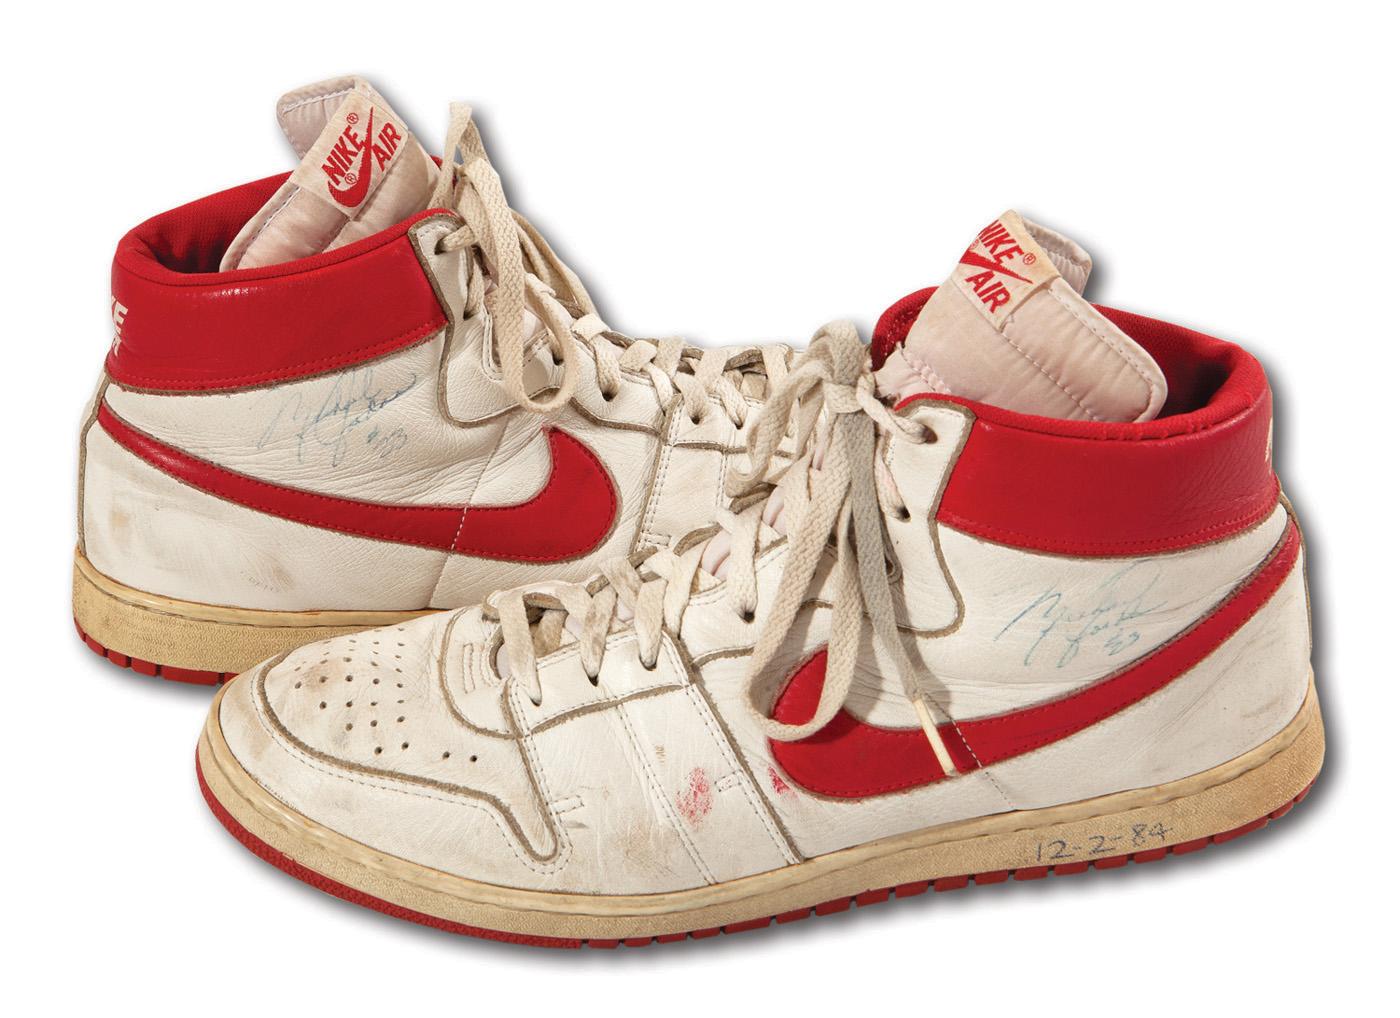 new products ed67c 1d236 Michael Jordan's rookie shoes top $70,000 at auction ...